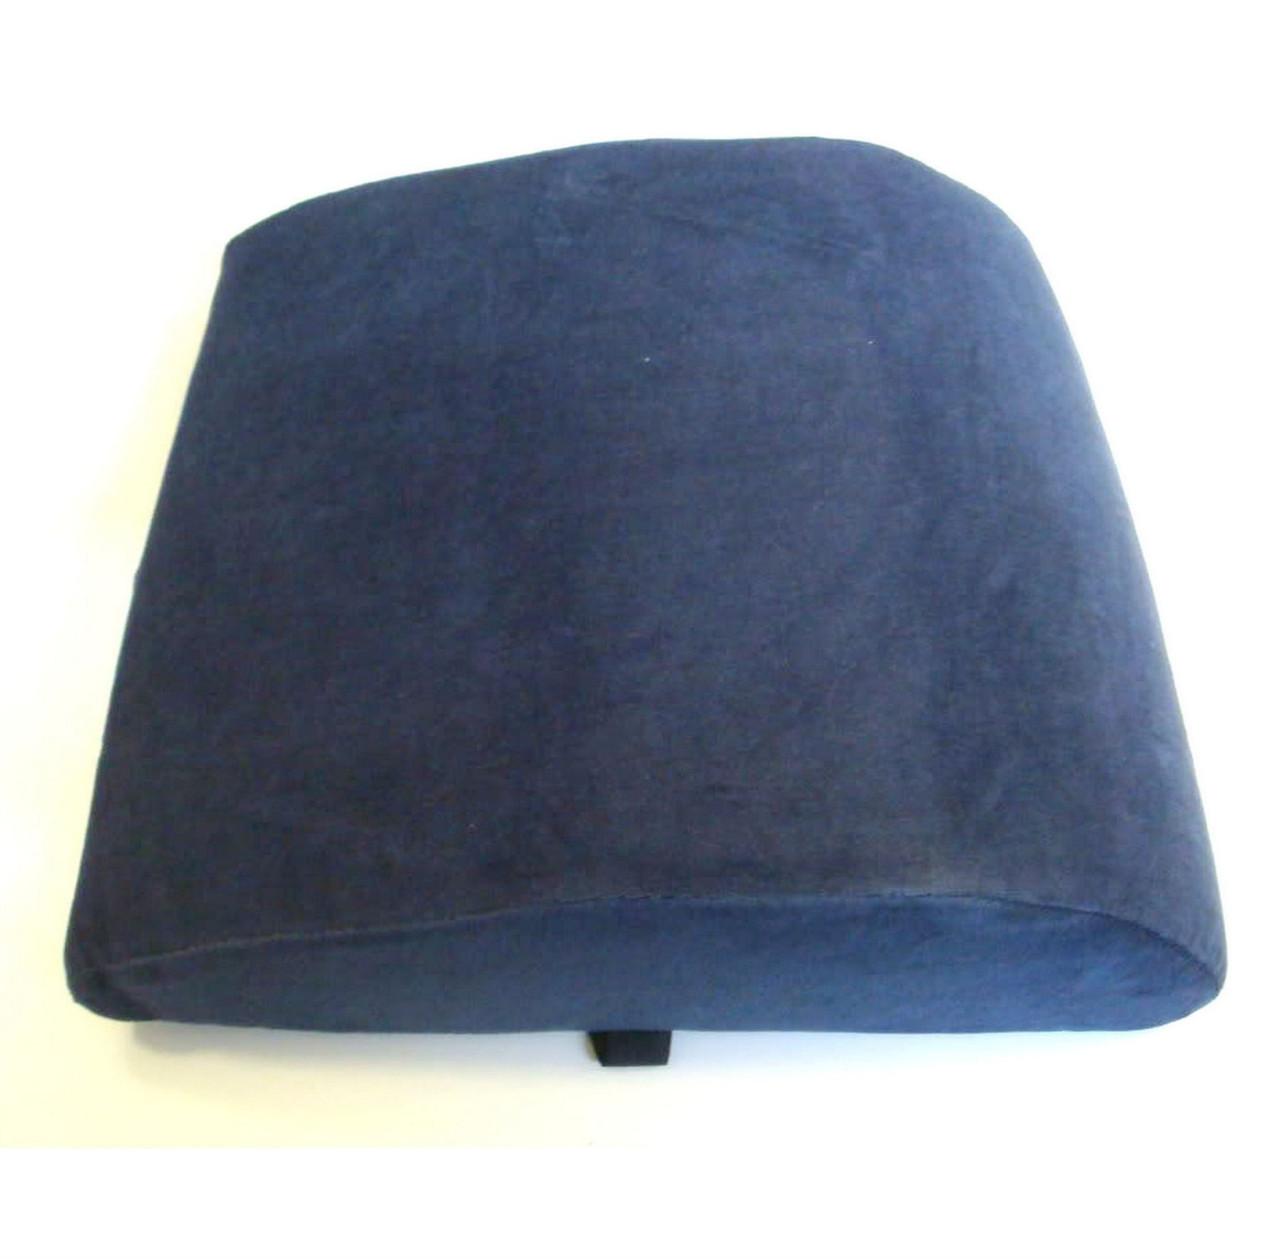 Large Back Support Lumbar Cushion Memory Foam Car Chair